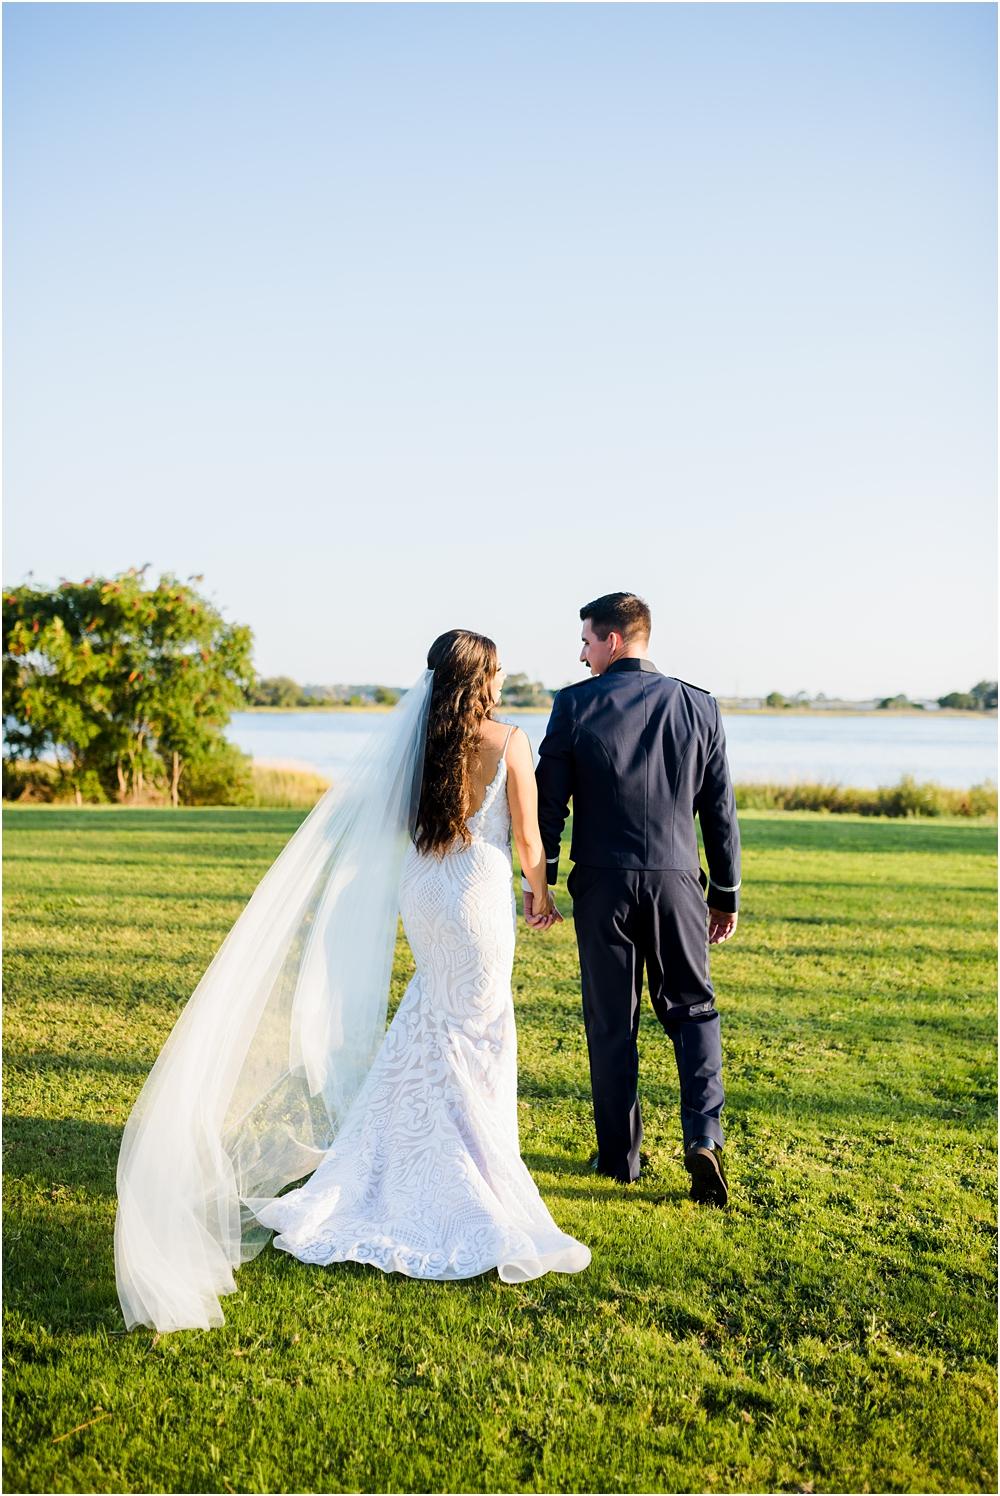 amack-wedding-kiersten-stevenson-photography-30a-panama-city-beach-dothan-tallahassee-(424-of-882).JPG